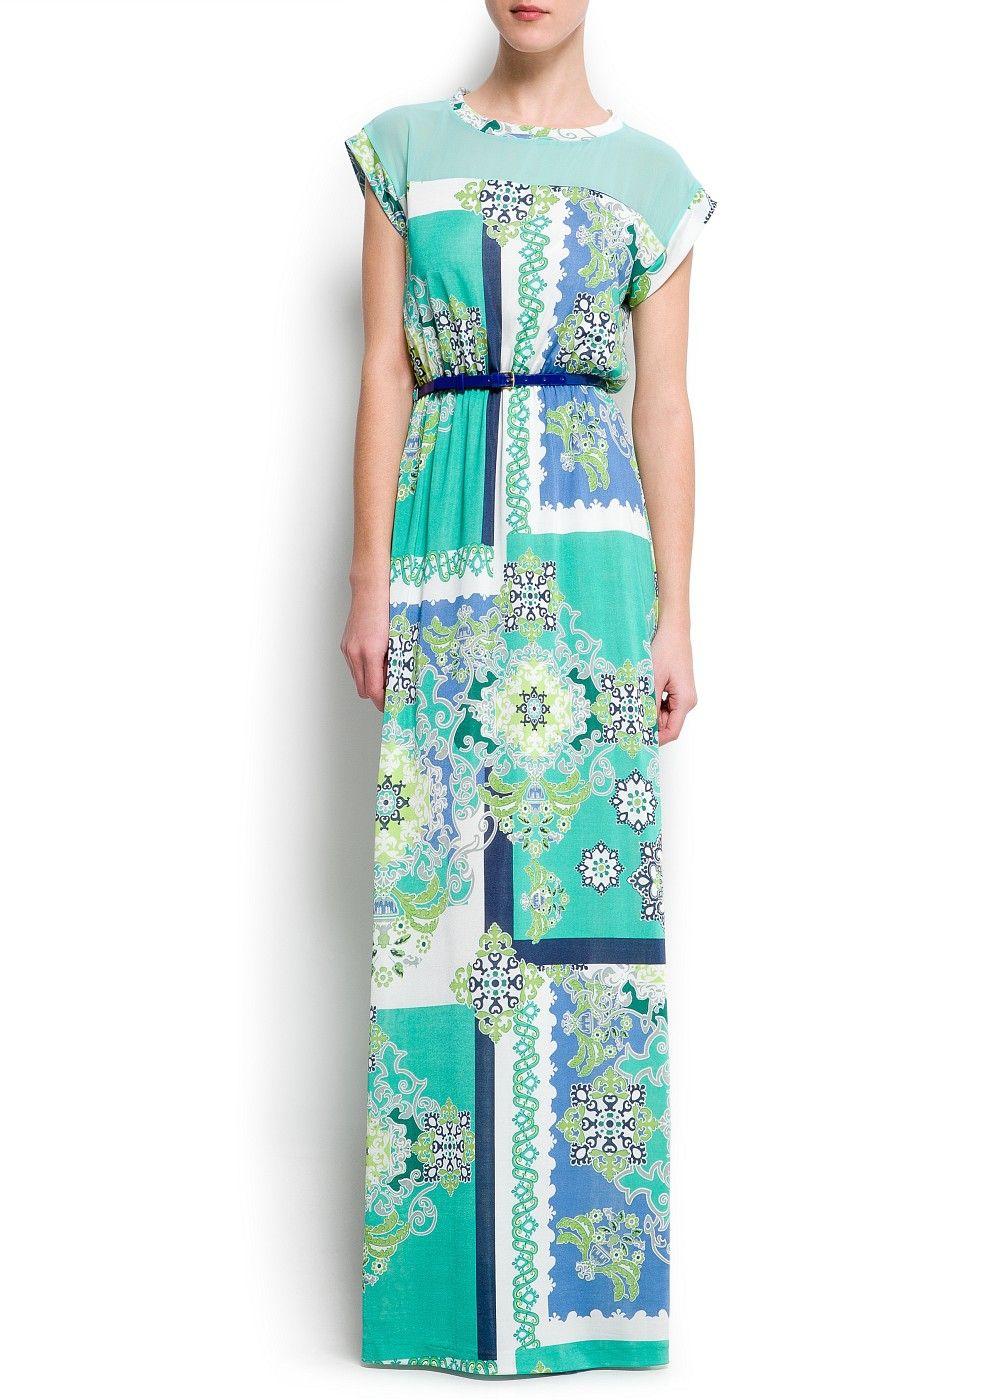 89821ccd1d5 MANGO - VÊTEMENTS - Robes - Maxis - Robe longue imprimé foulard